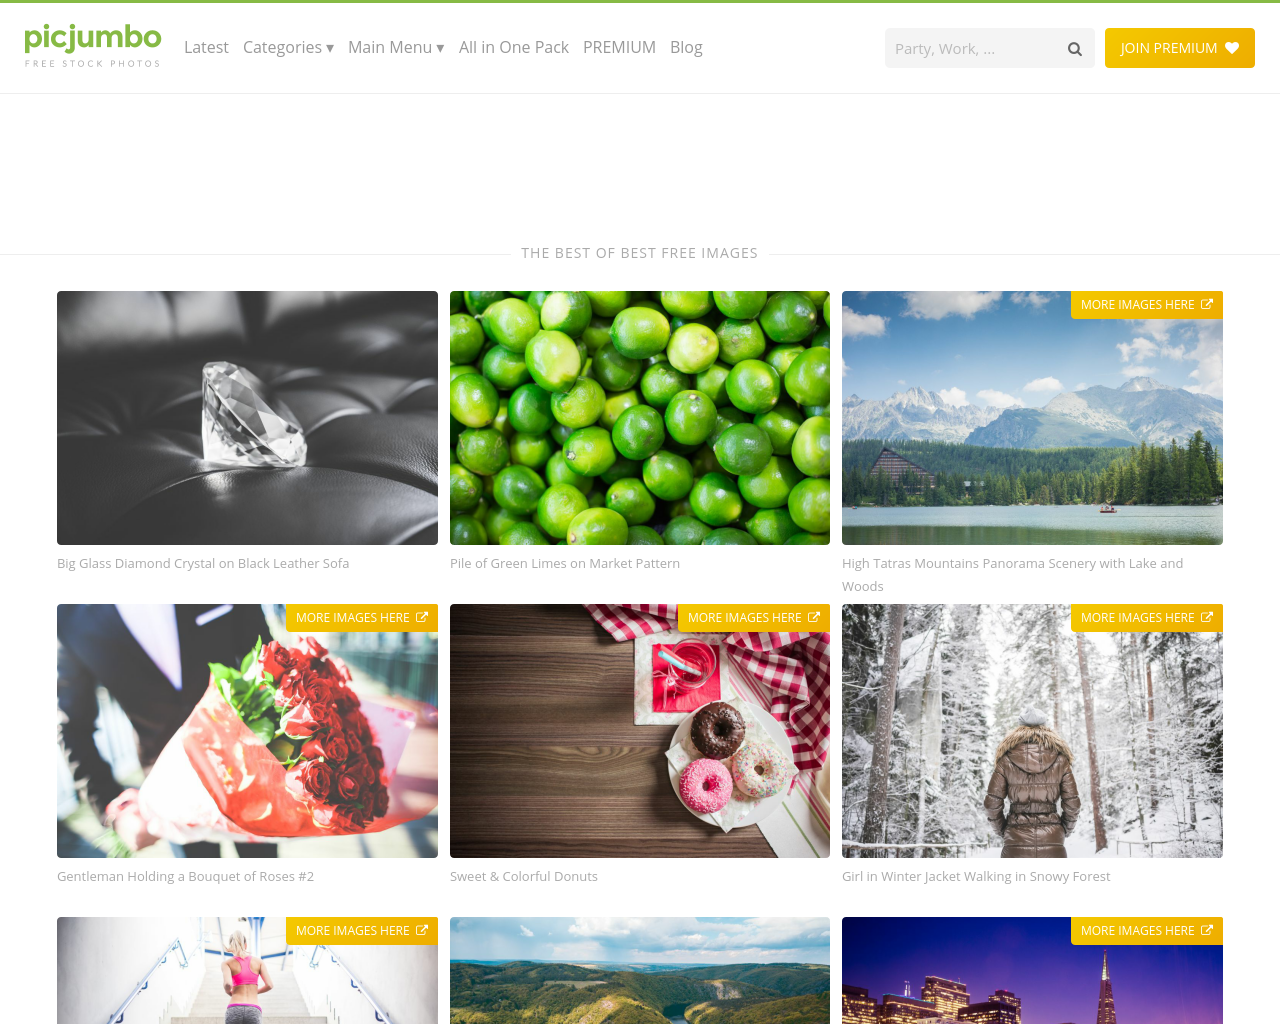 Picjumbo---TOP-Free-Photos-Advertising-Reviews-Pricing